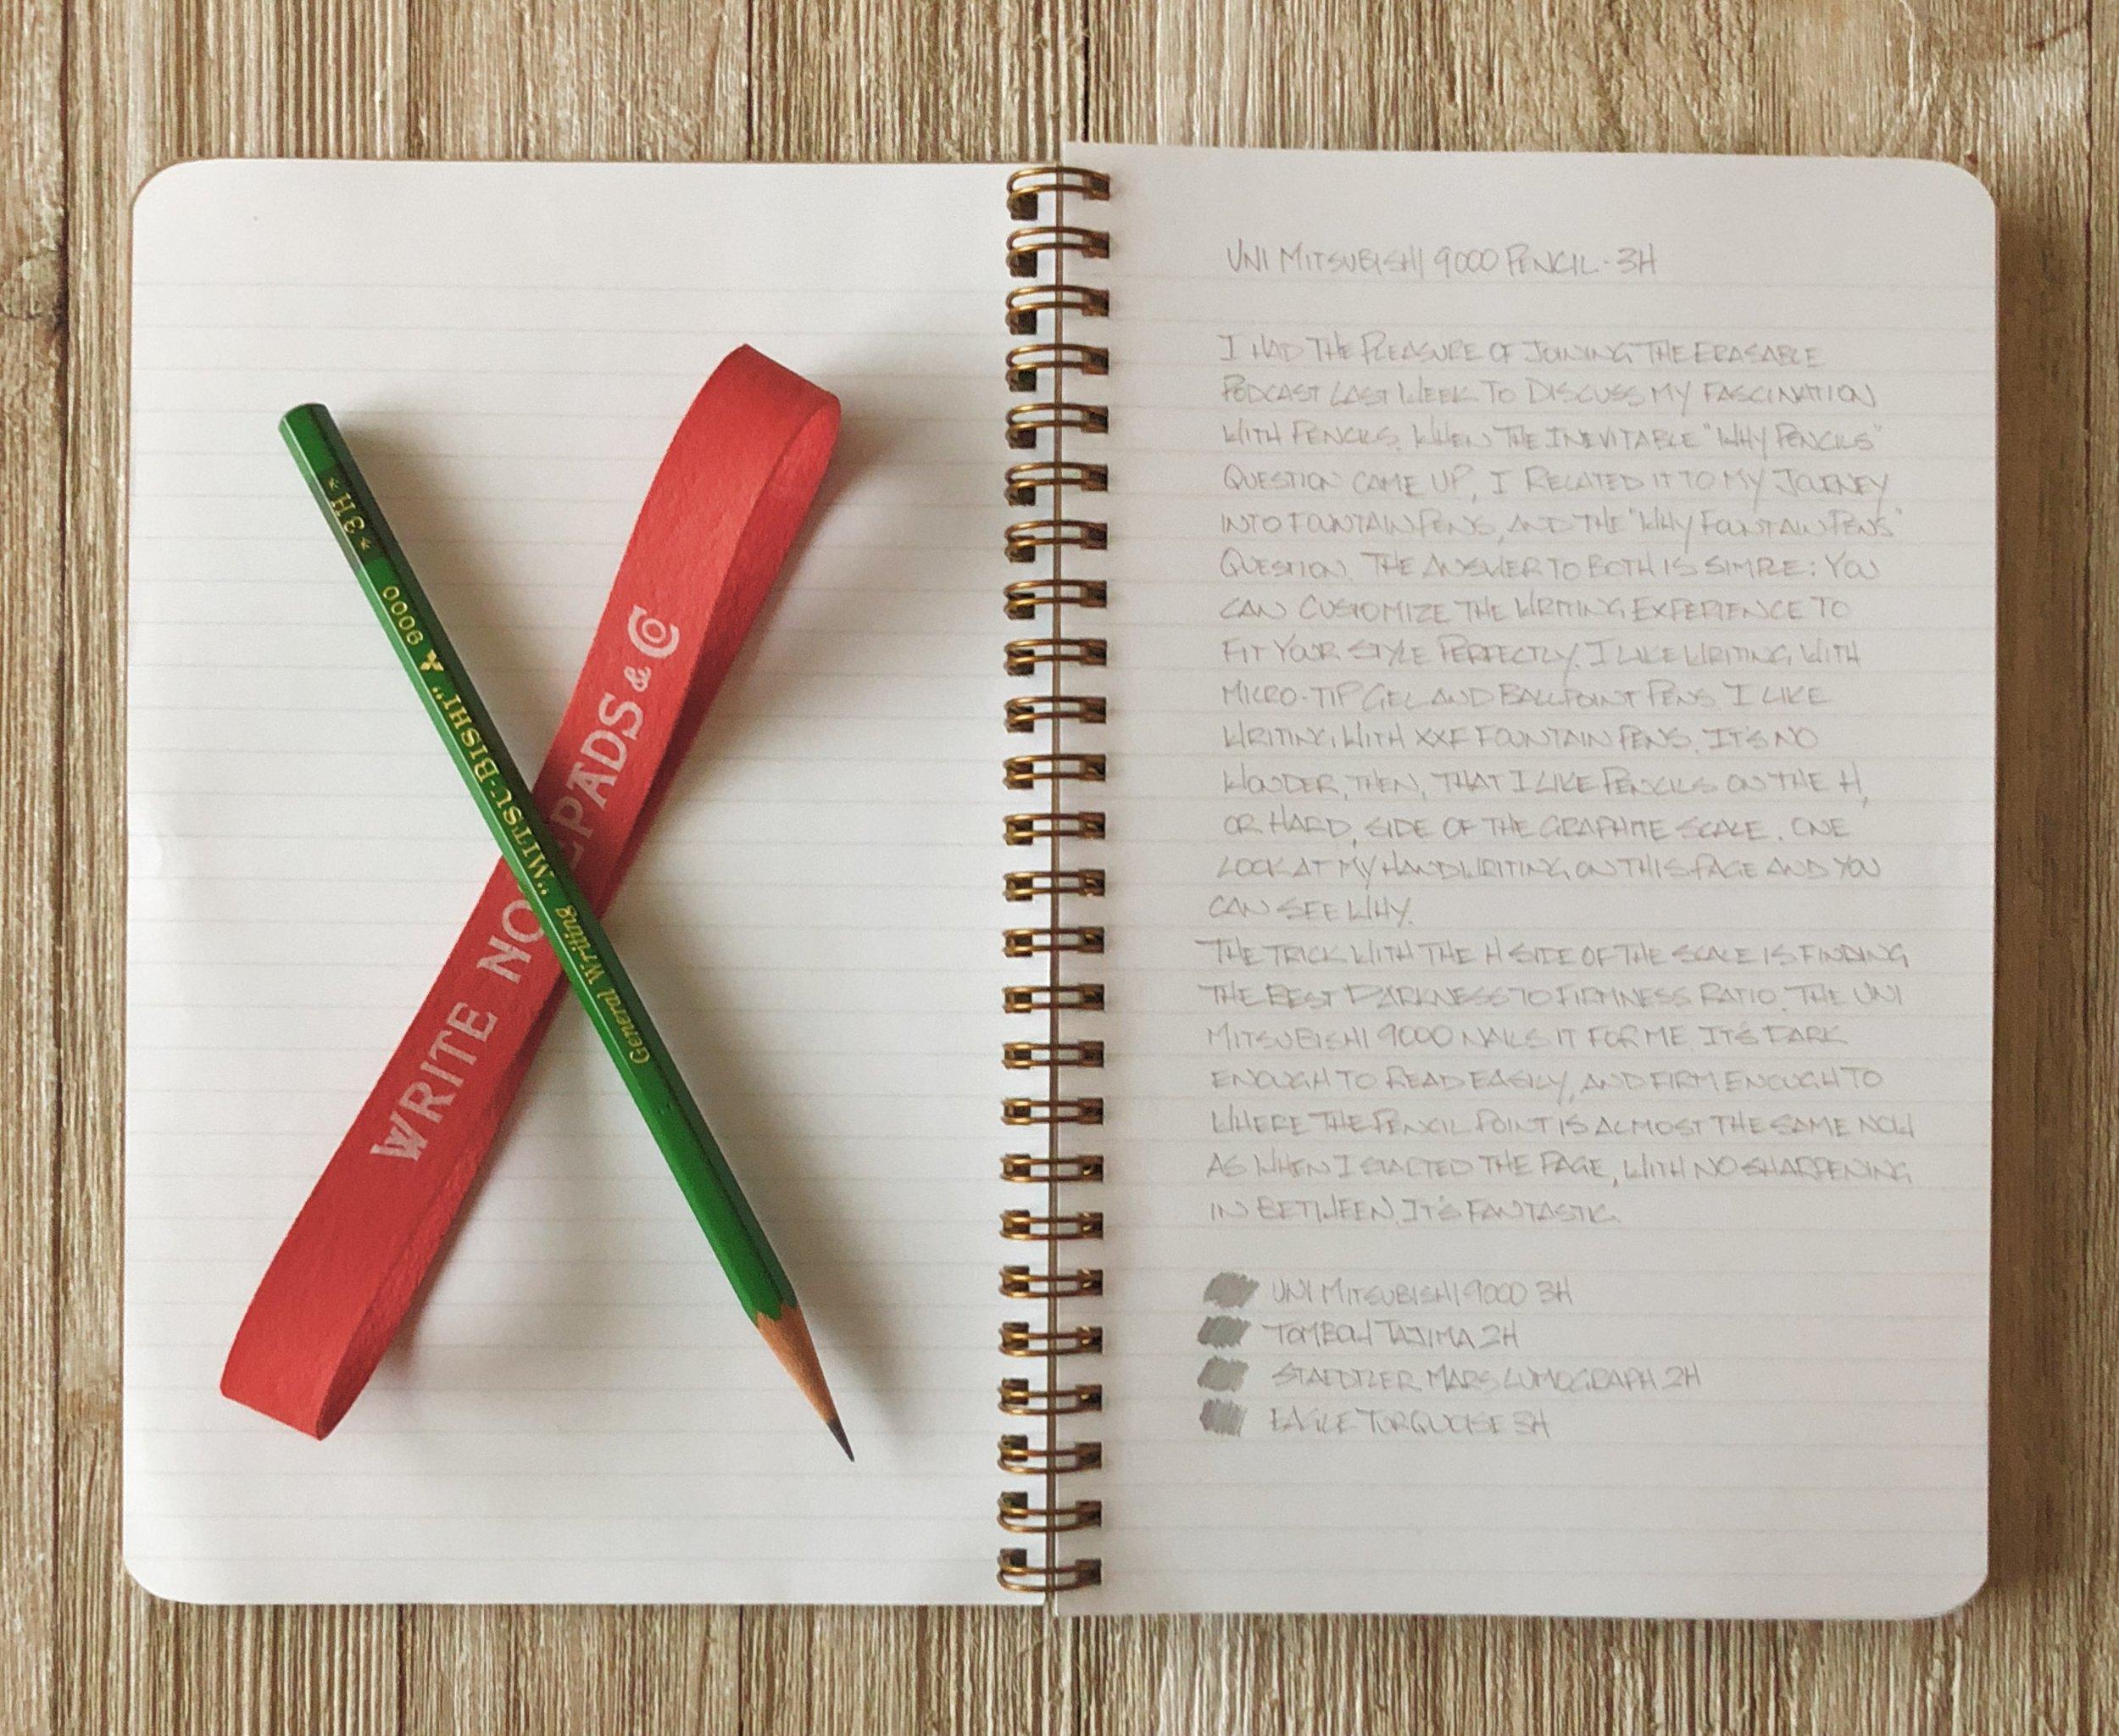 Uni Mitsubishi 9000 3H Pencil Sample